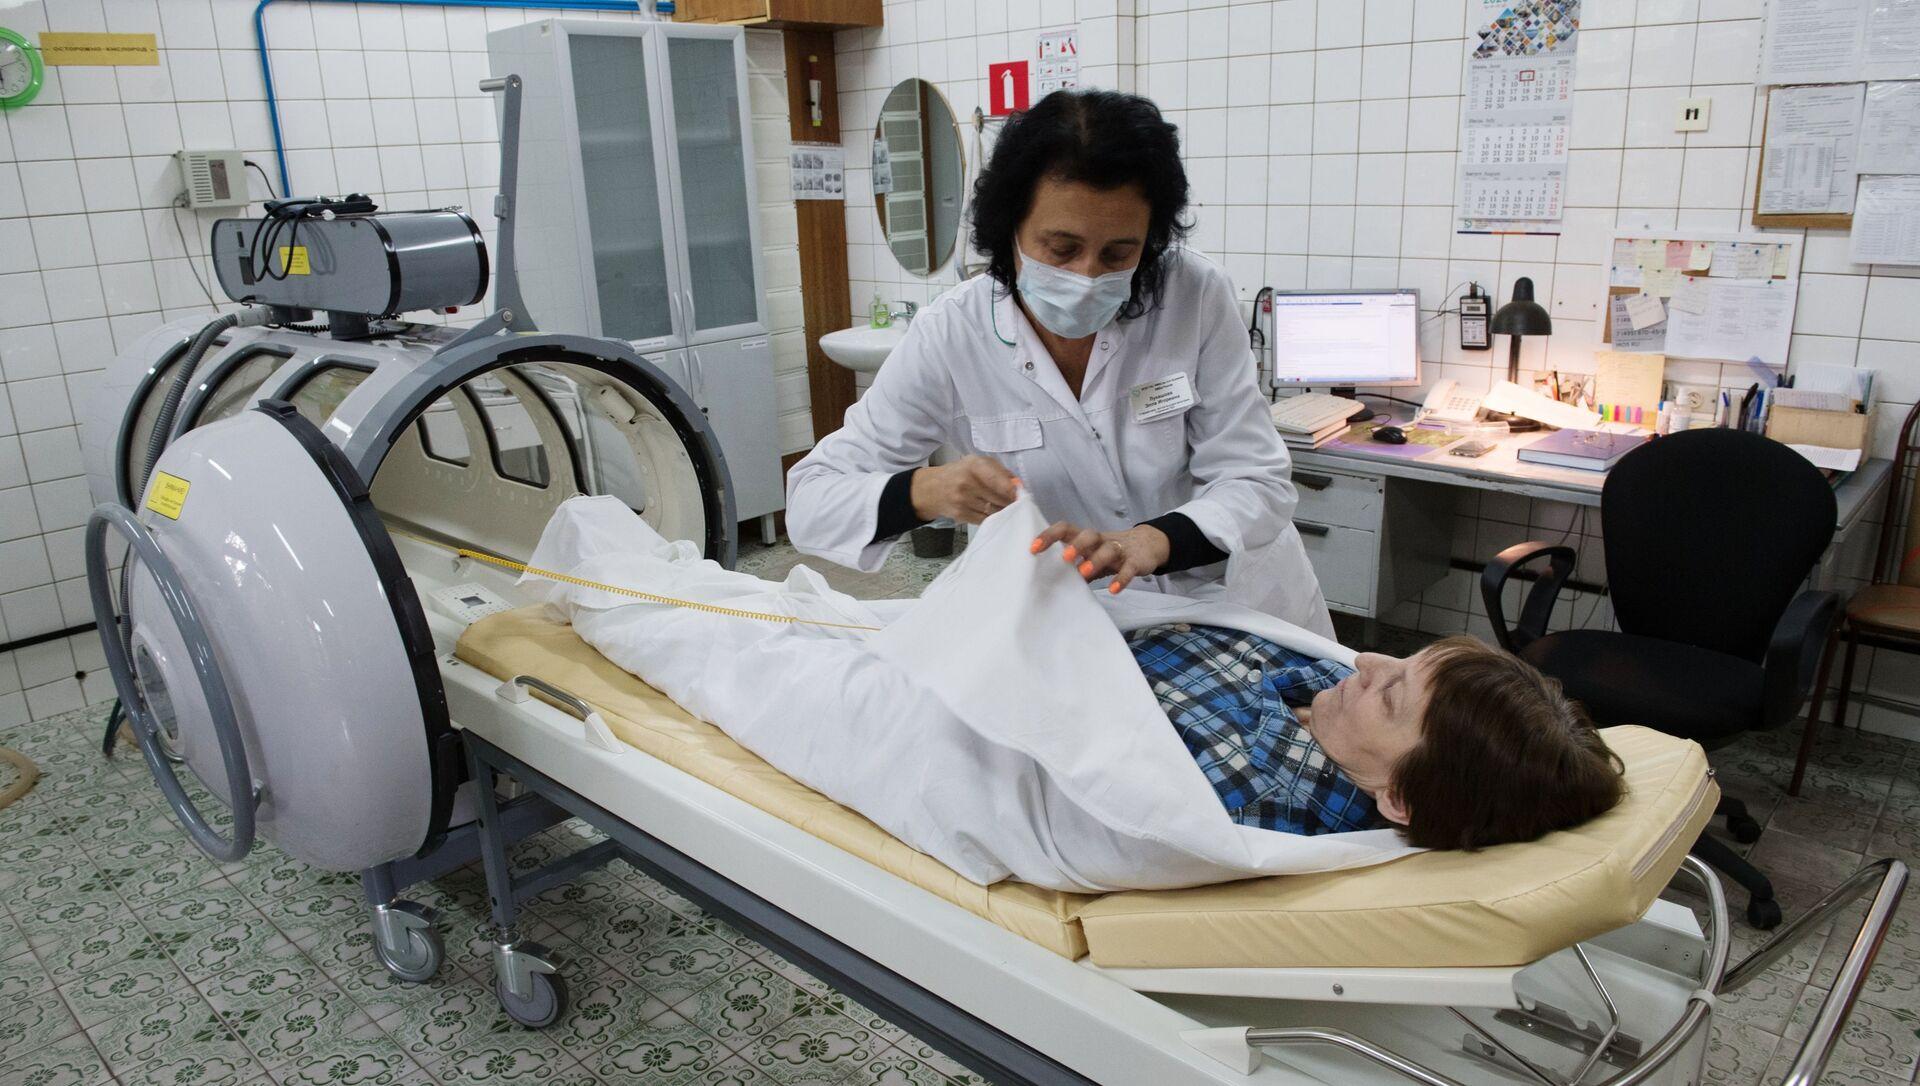 Лечение от коронавируса в барокамере - Sputnik Таджикистан, 1920, 03.02.2021